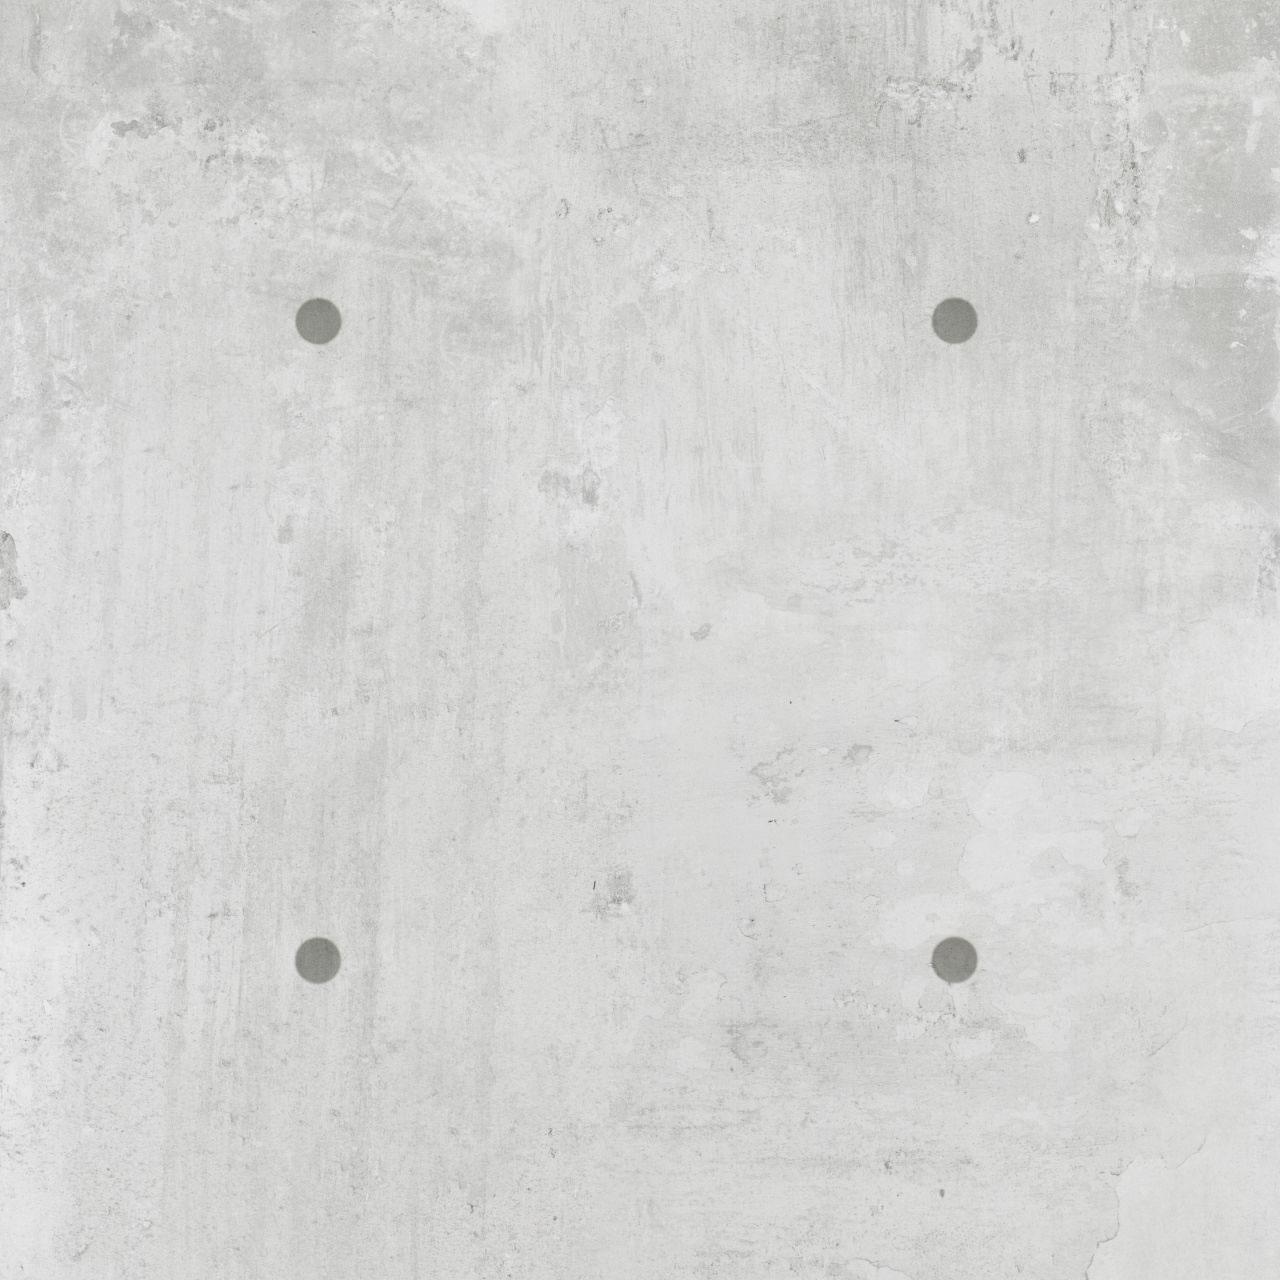 matriz concreto ma 90×90